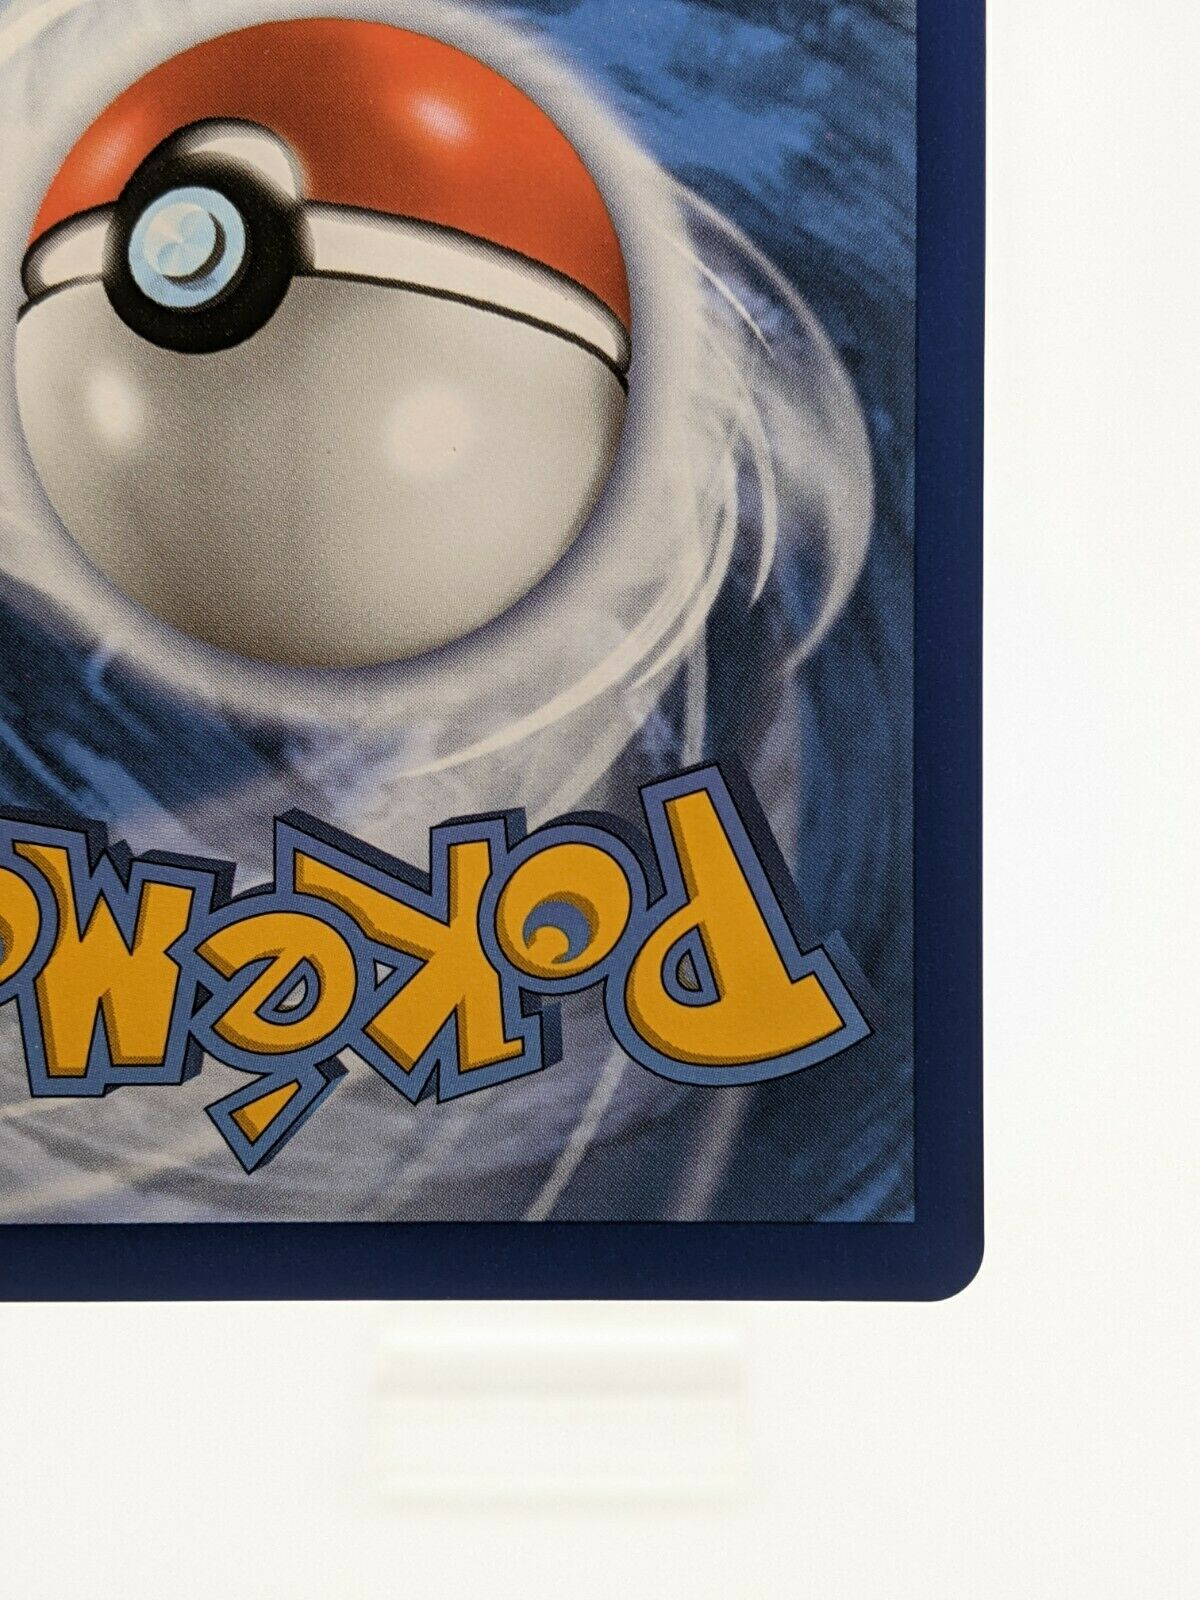 Water Energy 231/198 Chilling Reign Pokemon TCG Secret Rare NM - Image 10